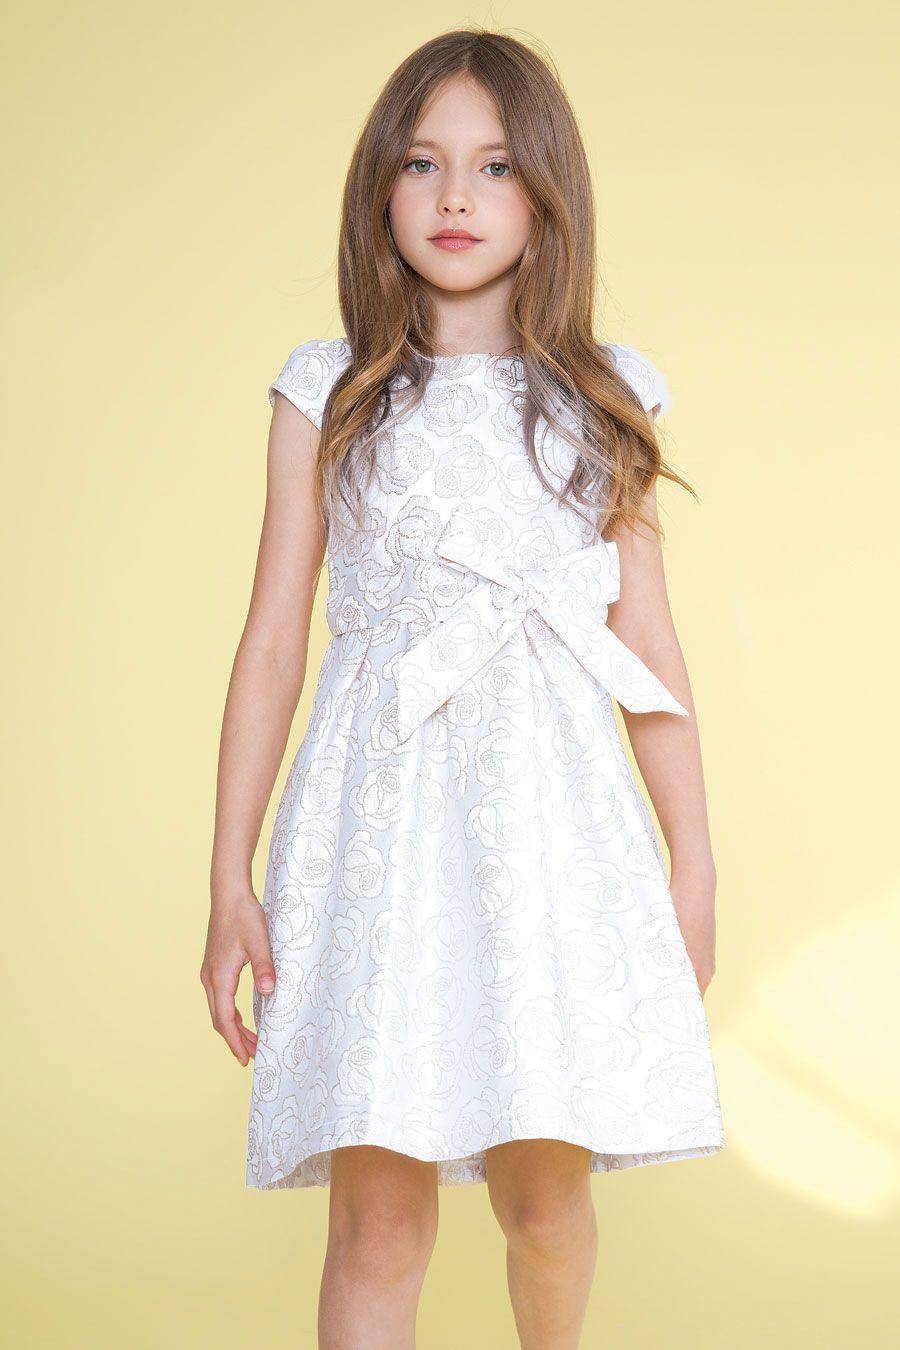 bb11d674f1ec CA_D1100SV - Girls Dress Style 1100 - Short Sleeve Short Jacquard Dress in  Choice of Color